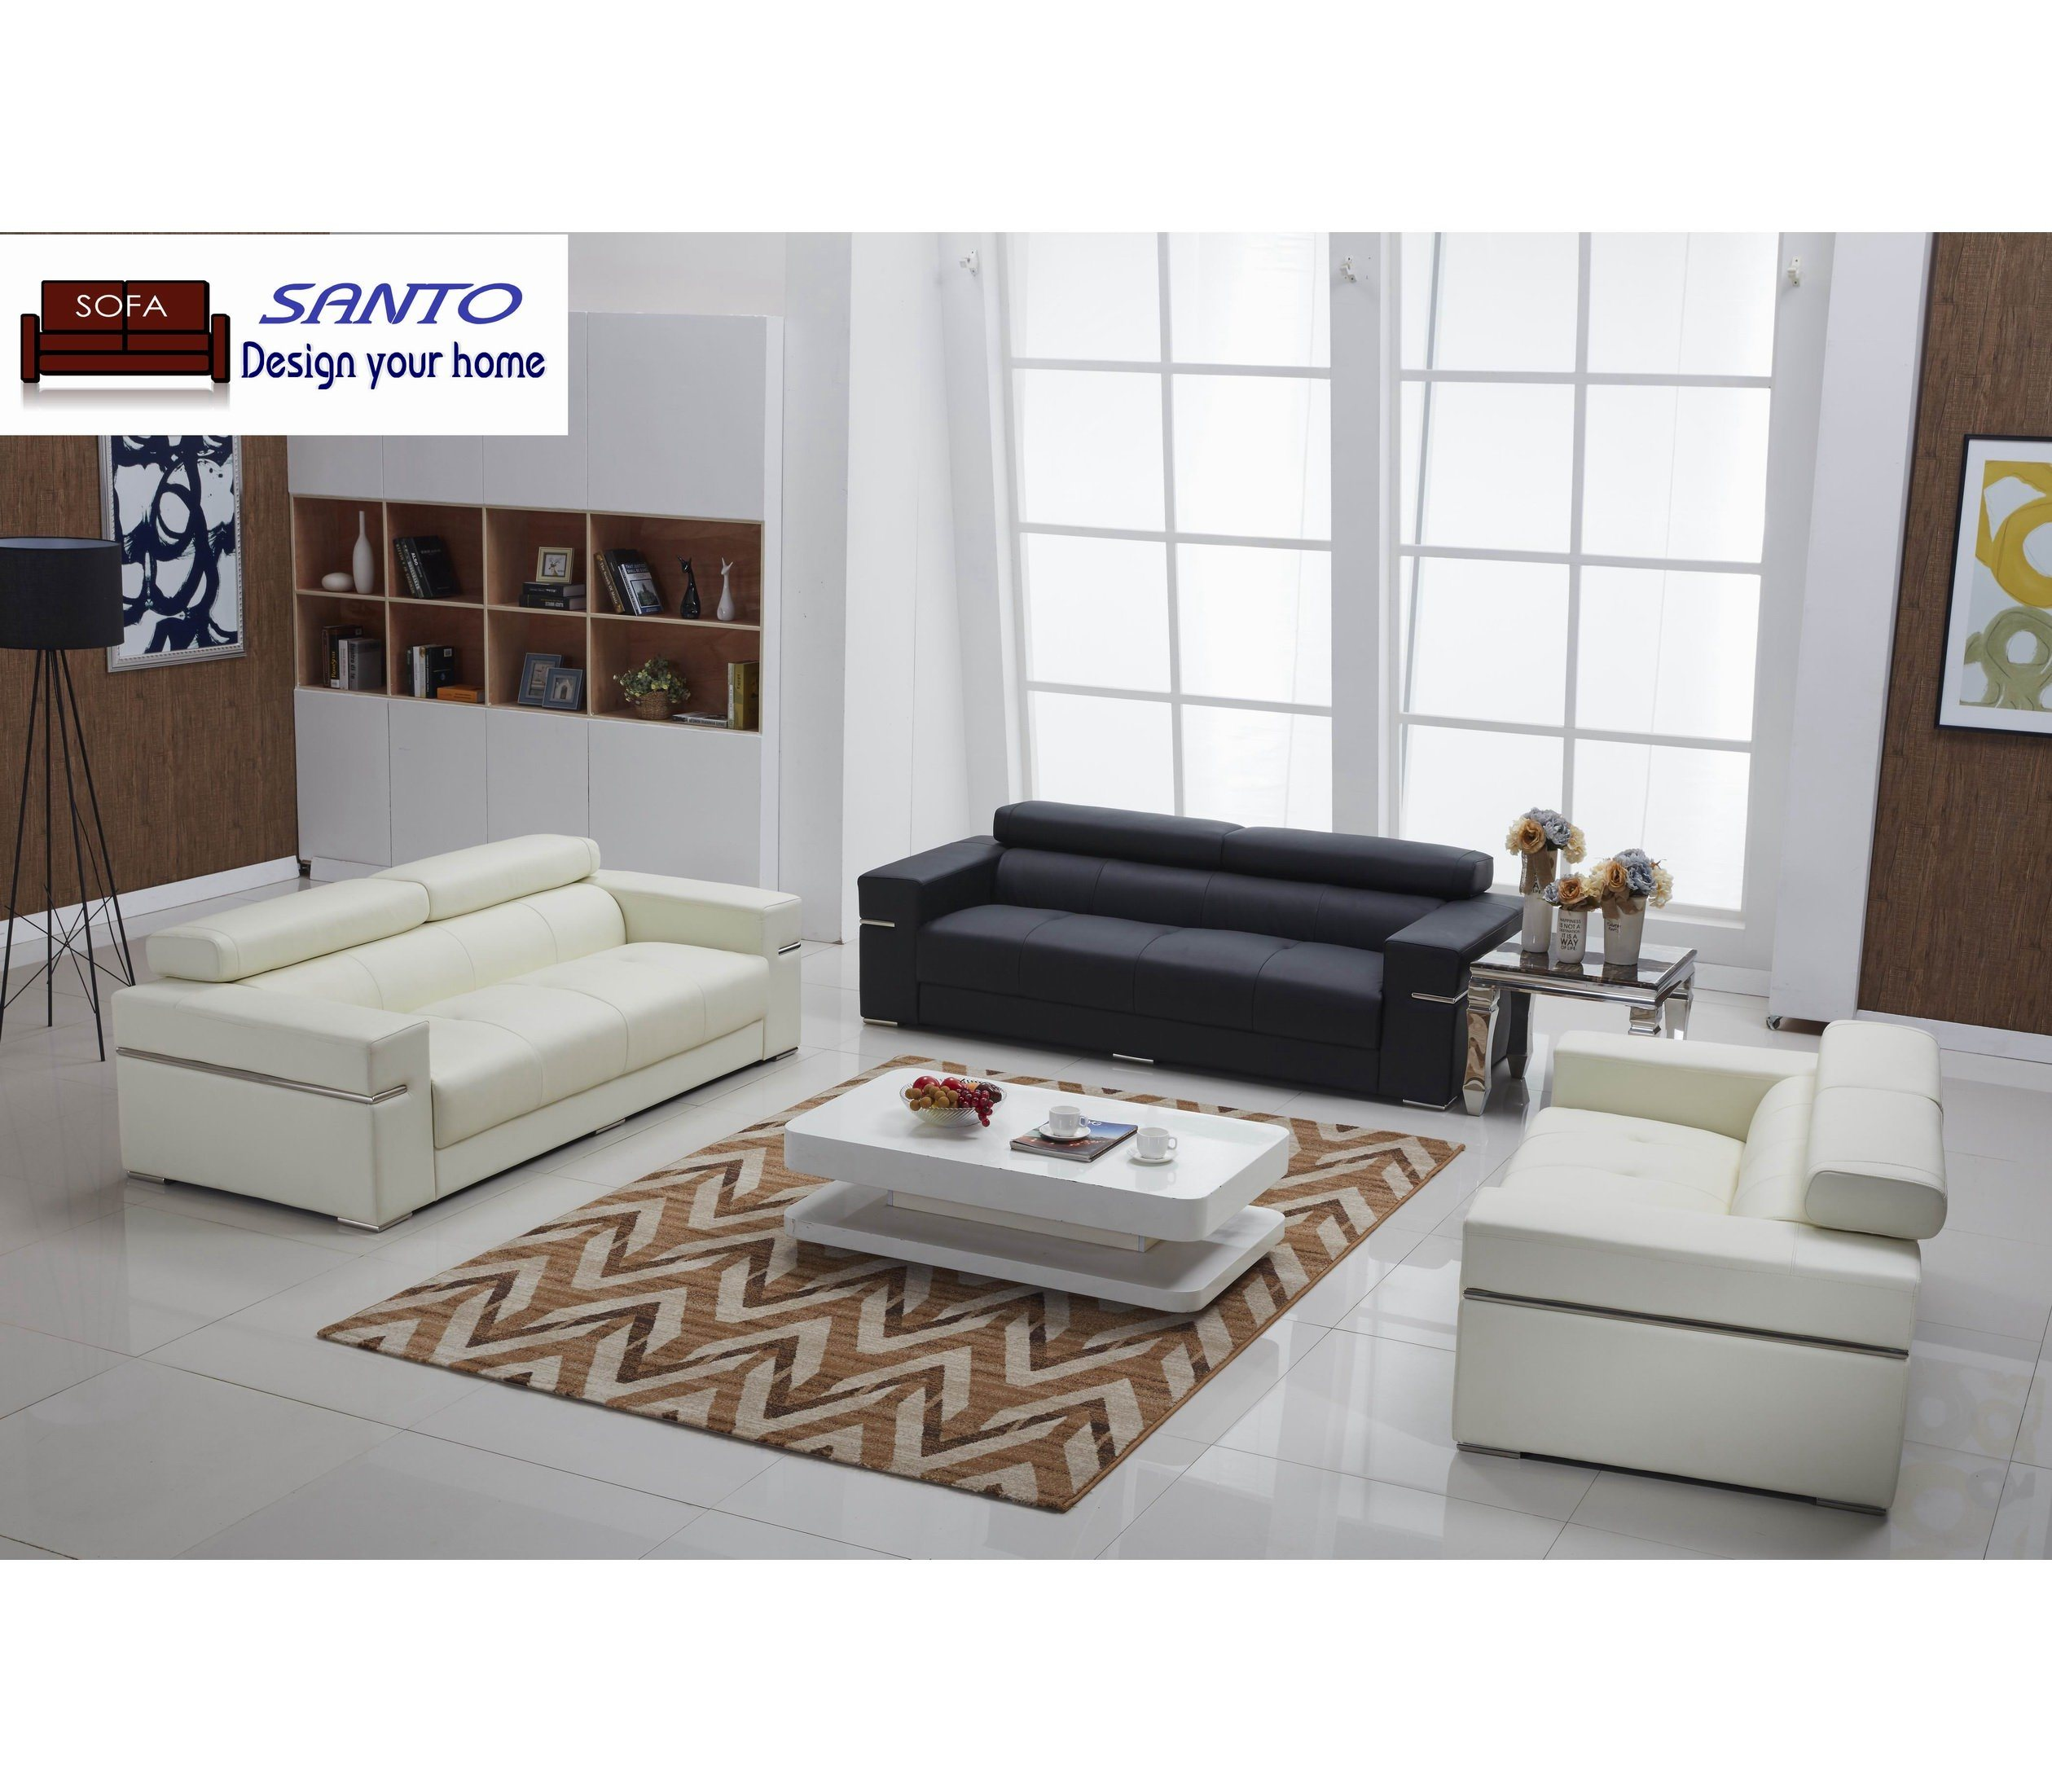 Luxury Stain Steel Black Leather Sofa